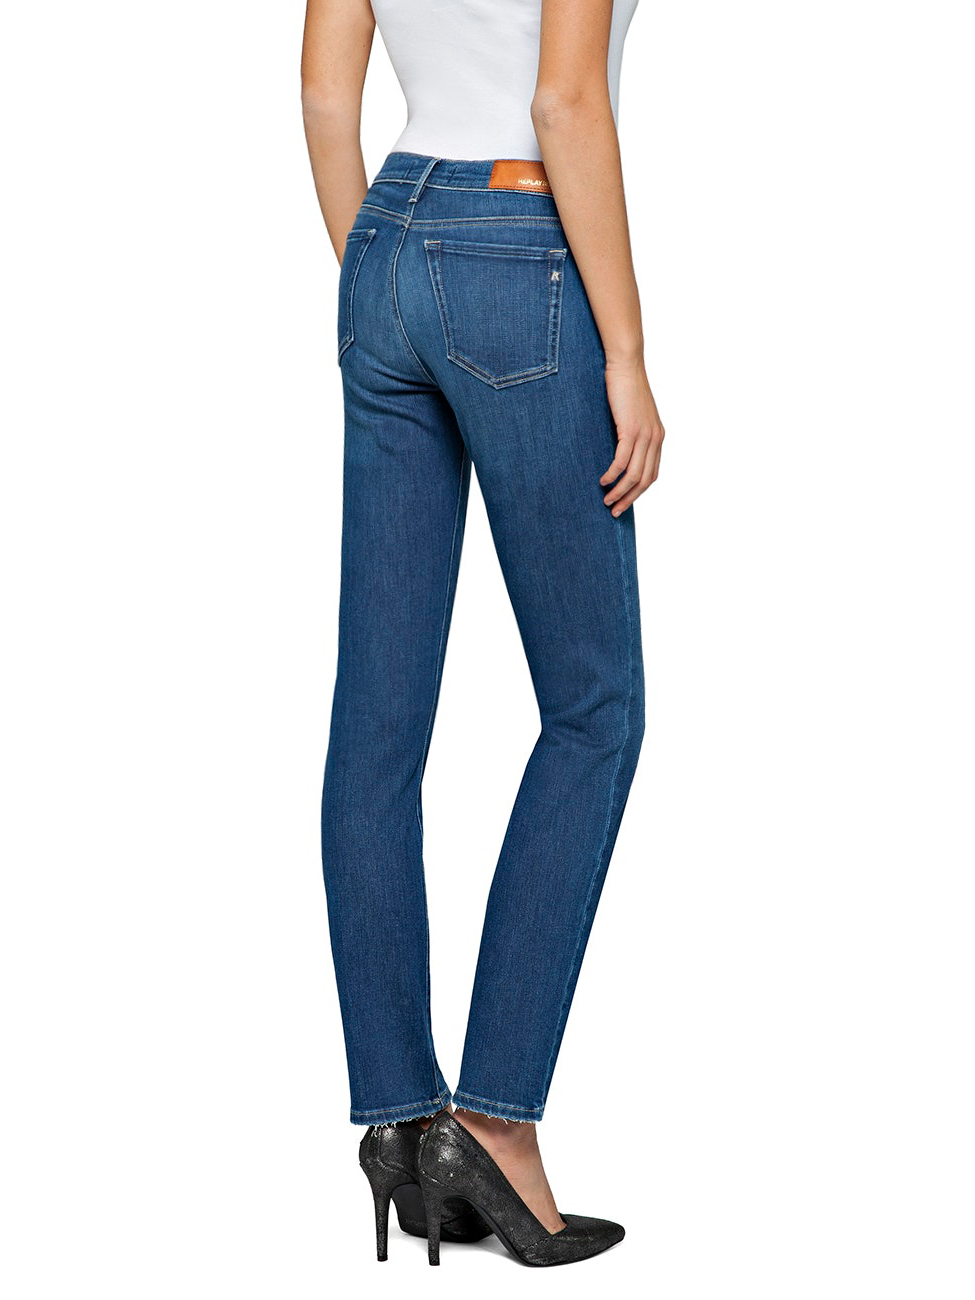 replay-damen-jeans-vivy-slim-fit-blau-mid-blue